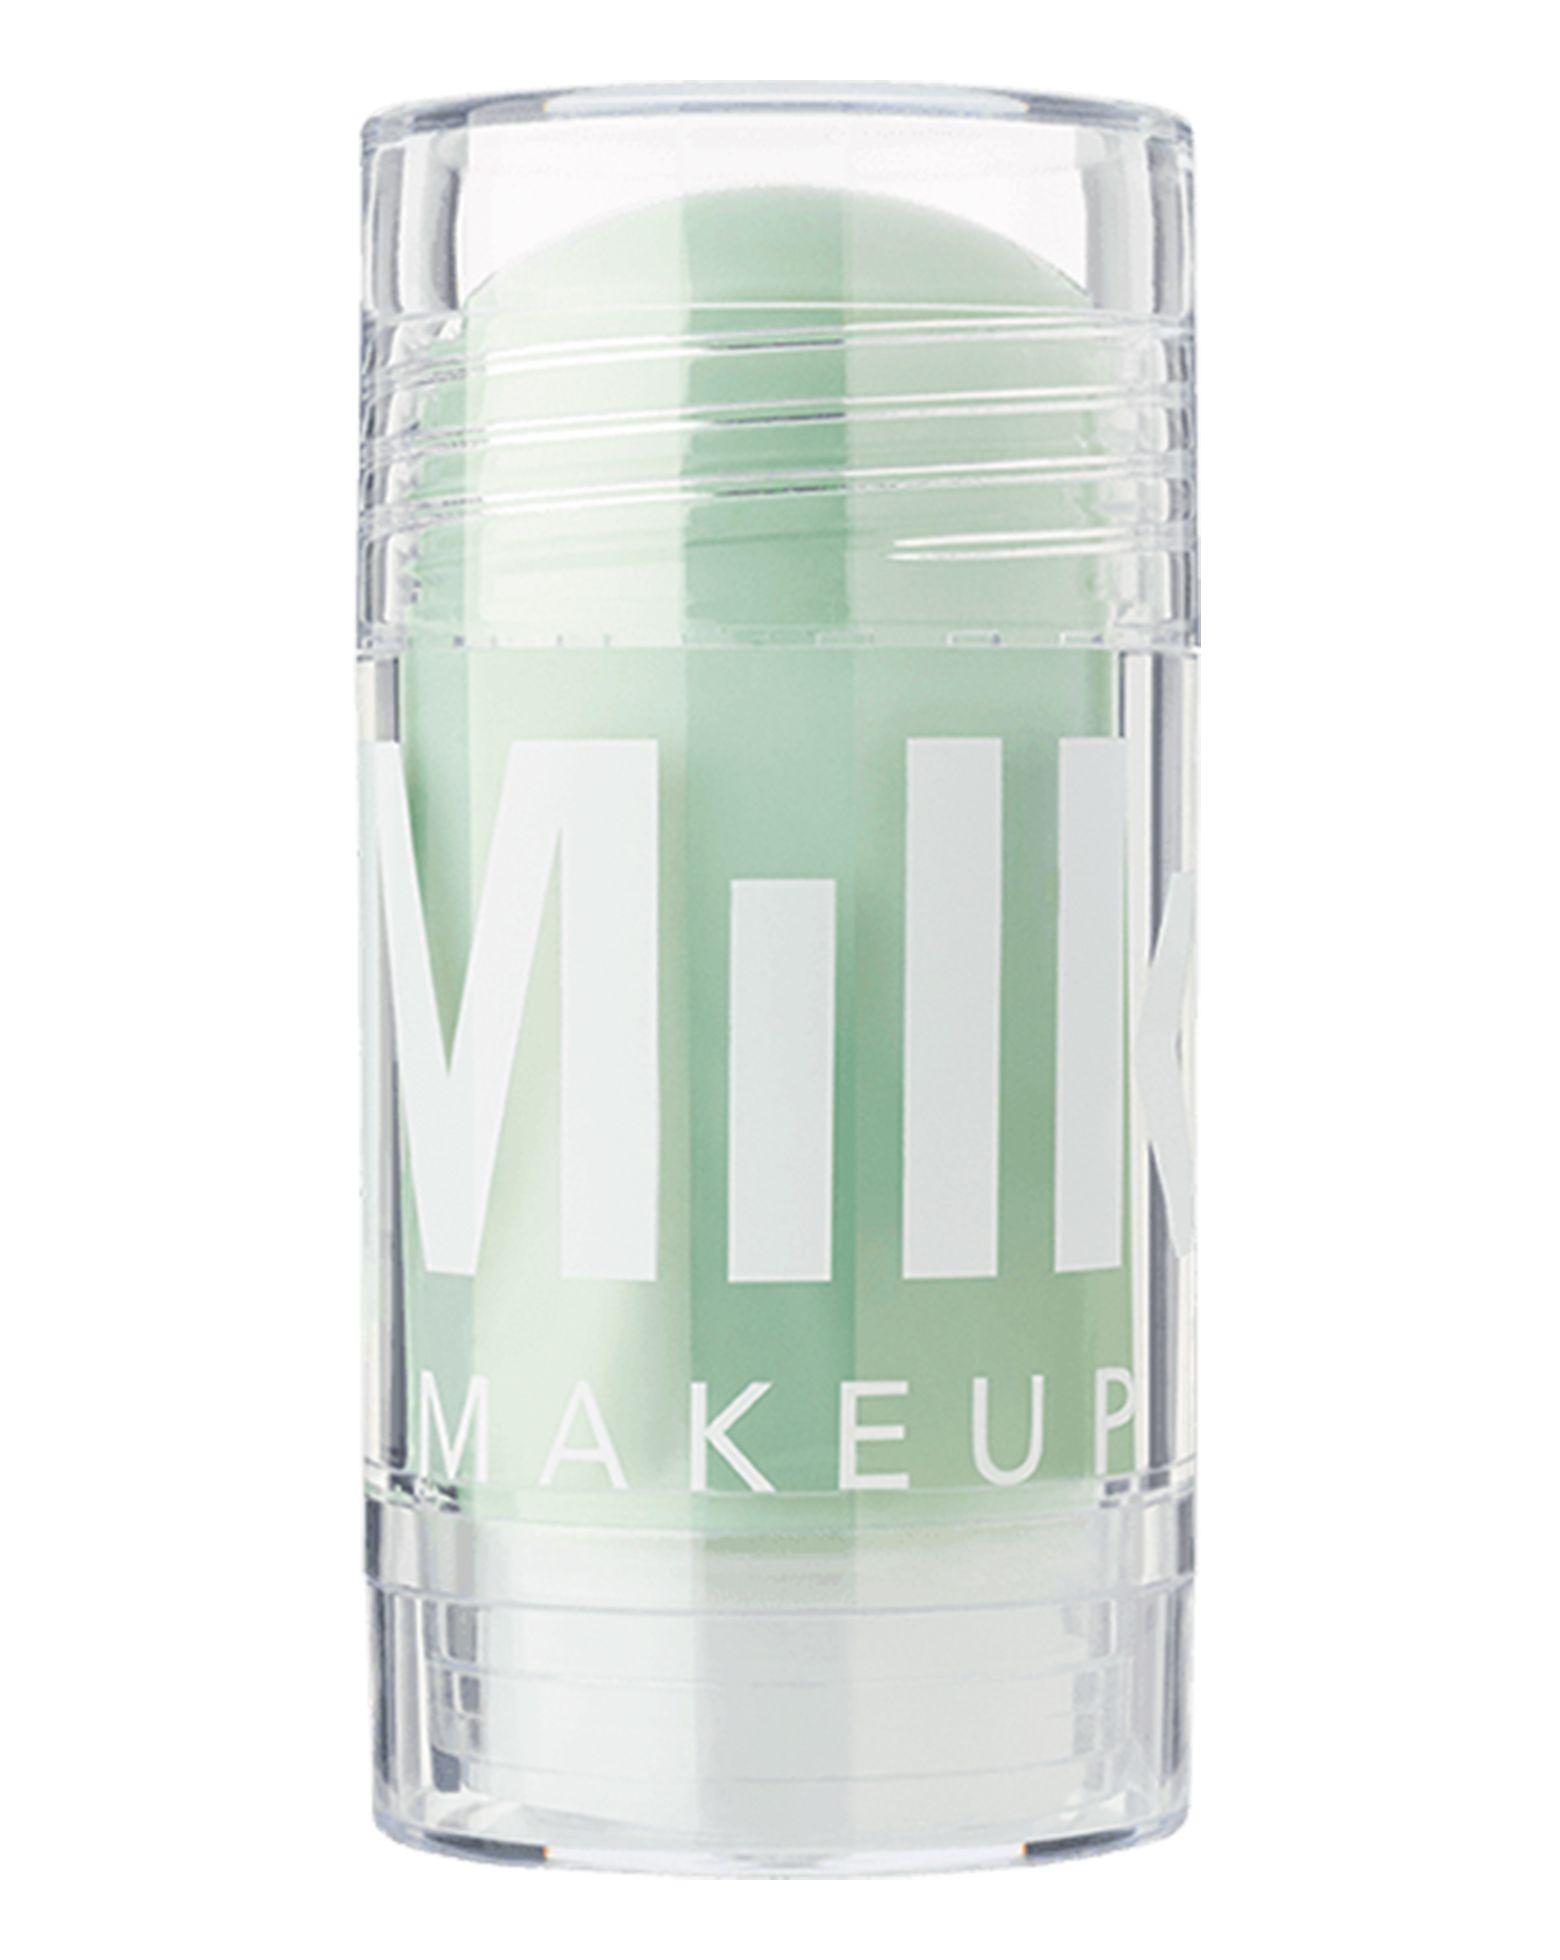 Milk Makeup Matcha Cleanser Milk makeup, Skin cleanser